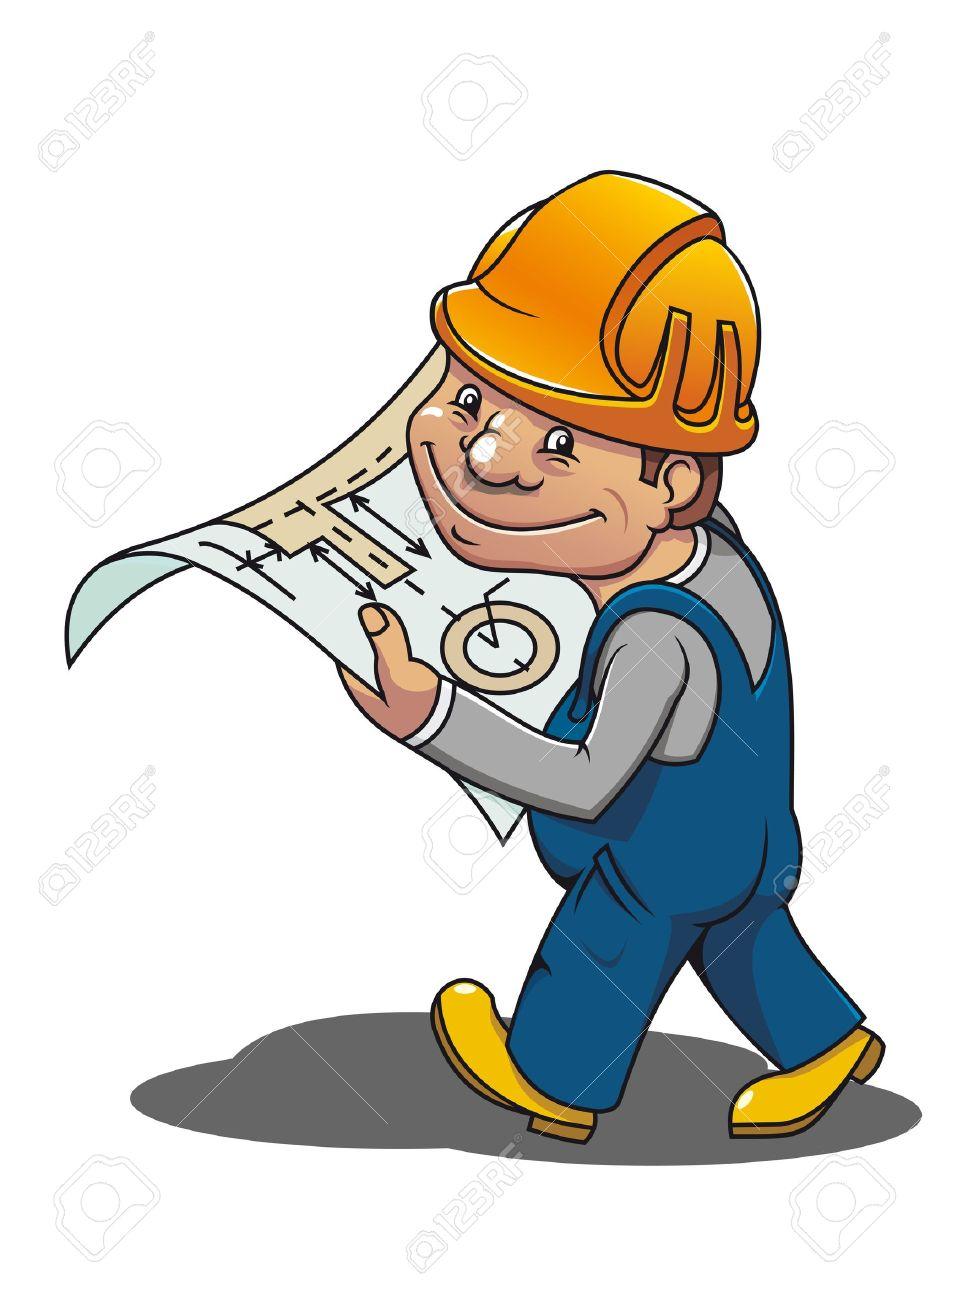 Smiling cartoon worker with scheme for industrial design Stock Vector - 9779214